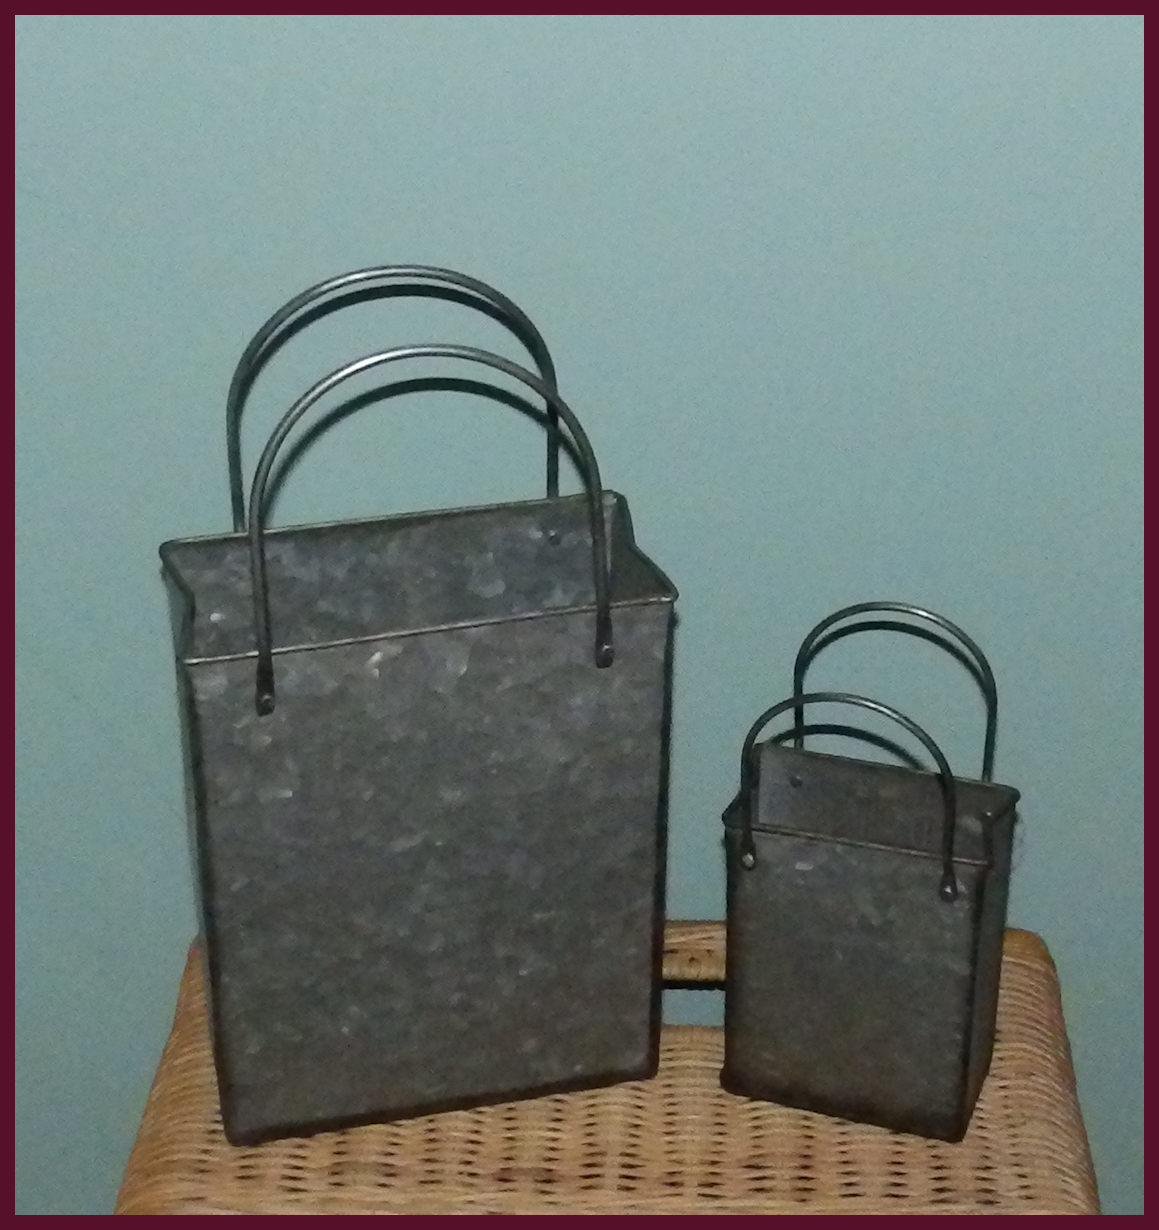 metal-bucket-rectangular-set-of-2-tma87168.jpg